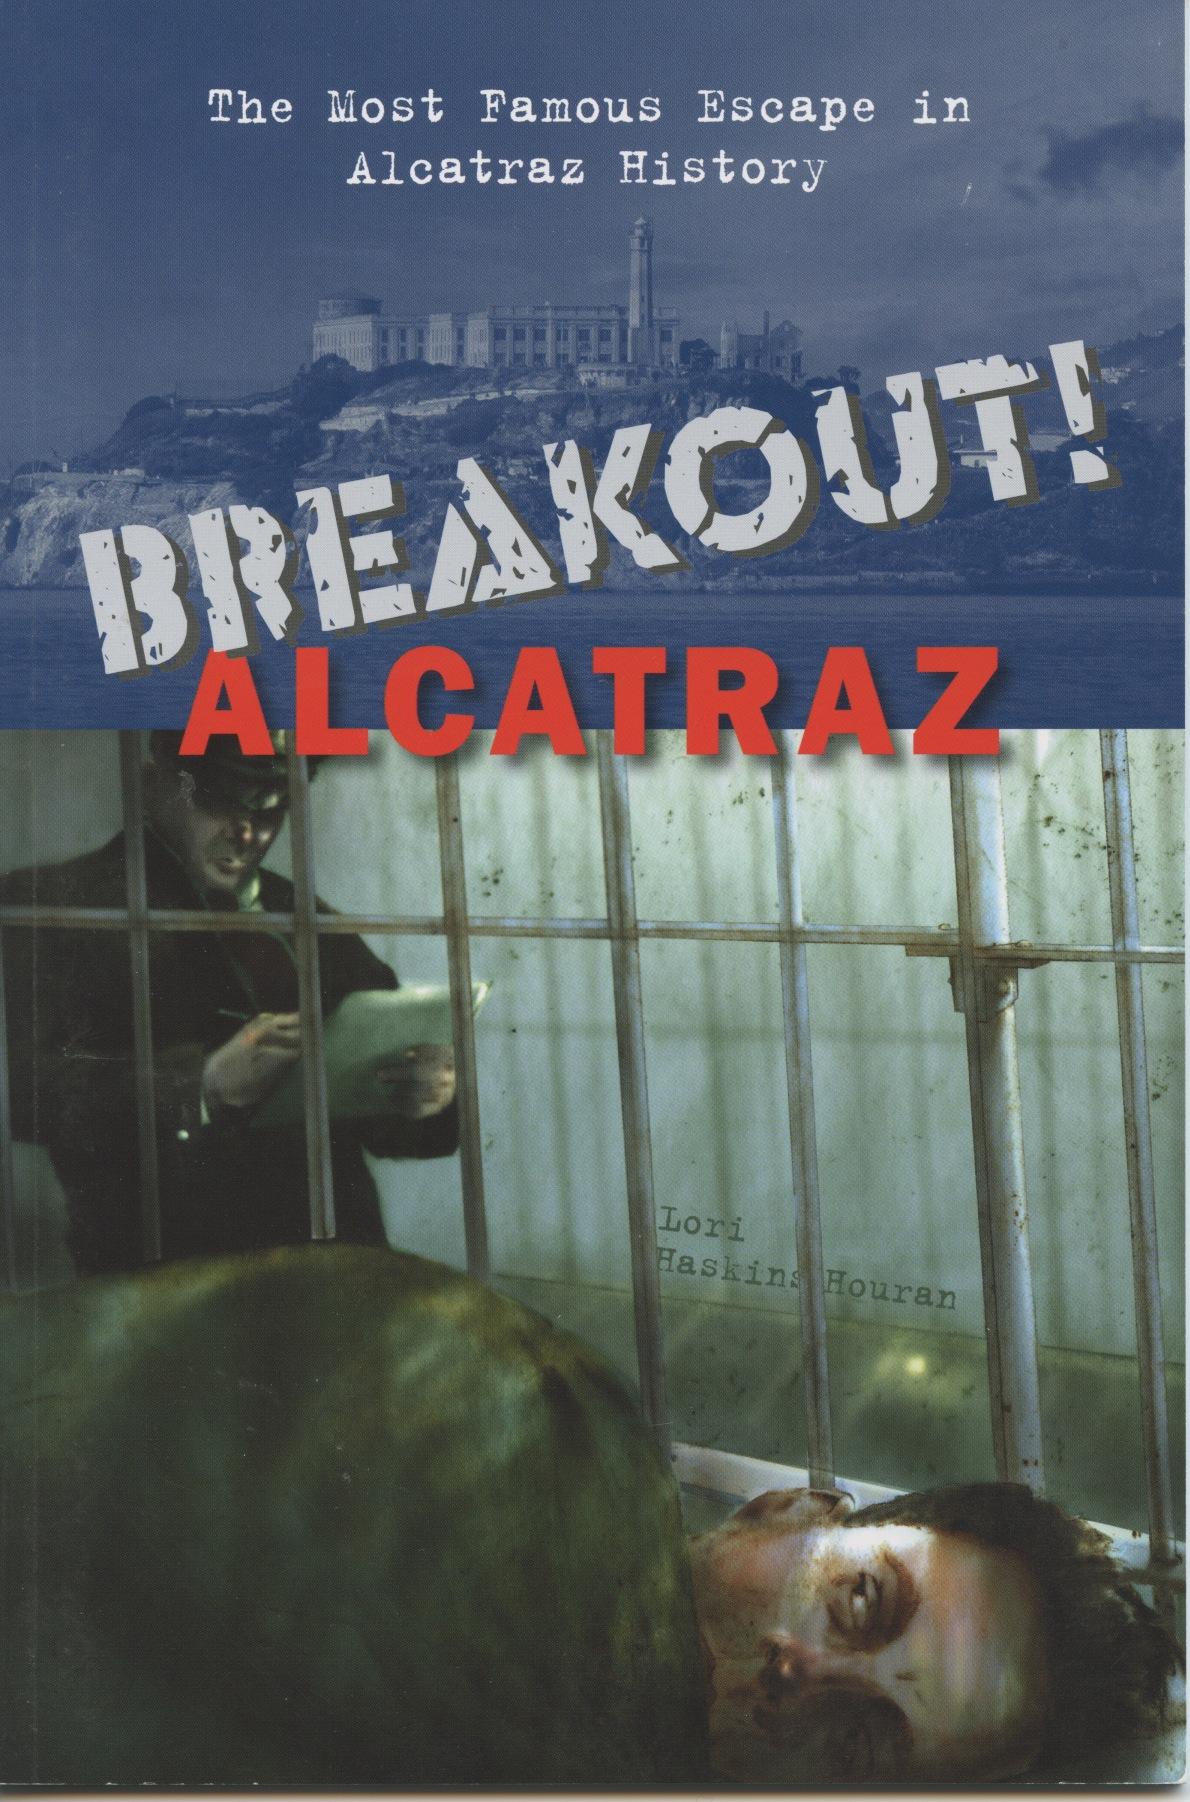 Alcatraz cover.jpeg